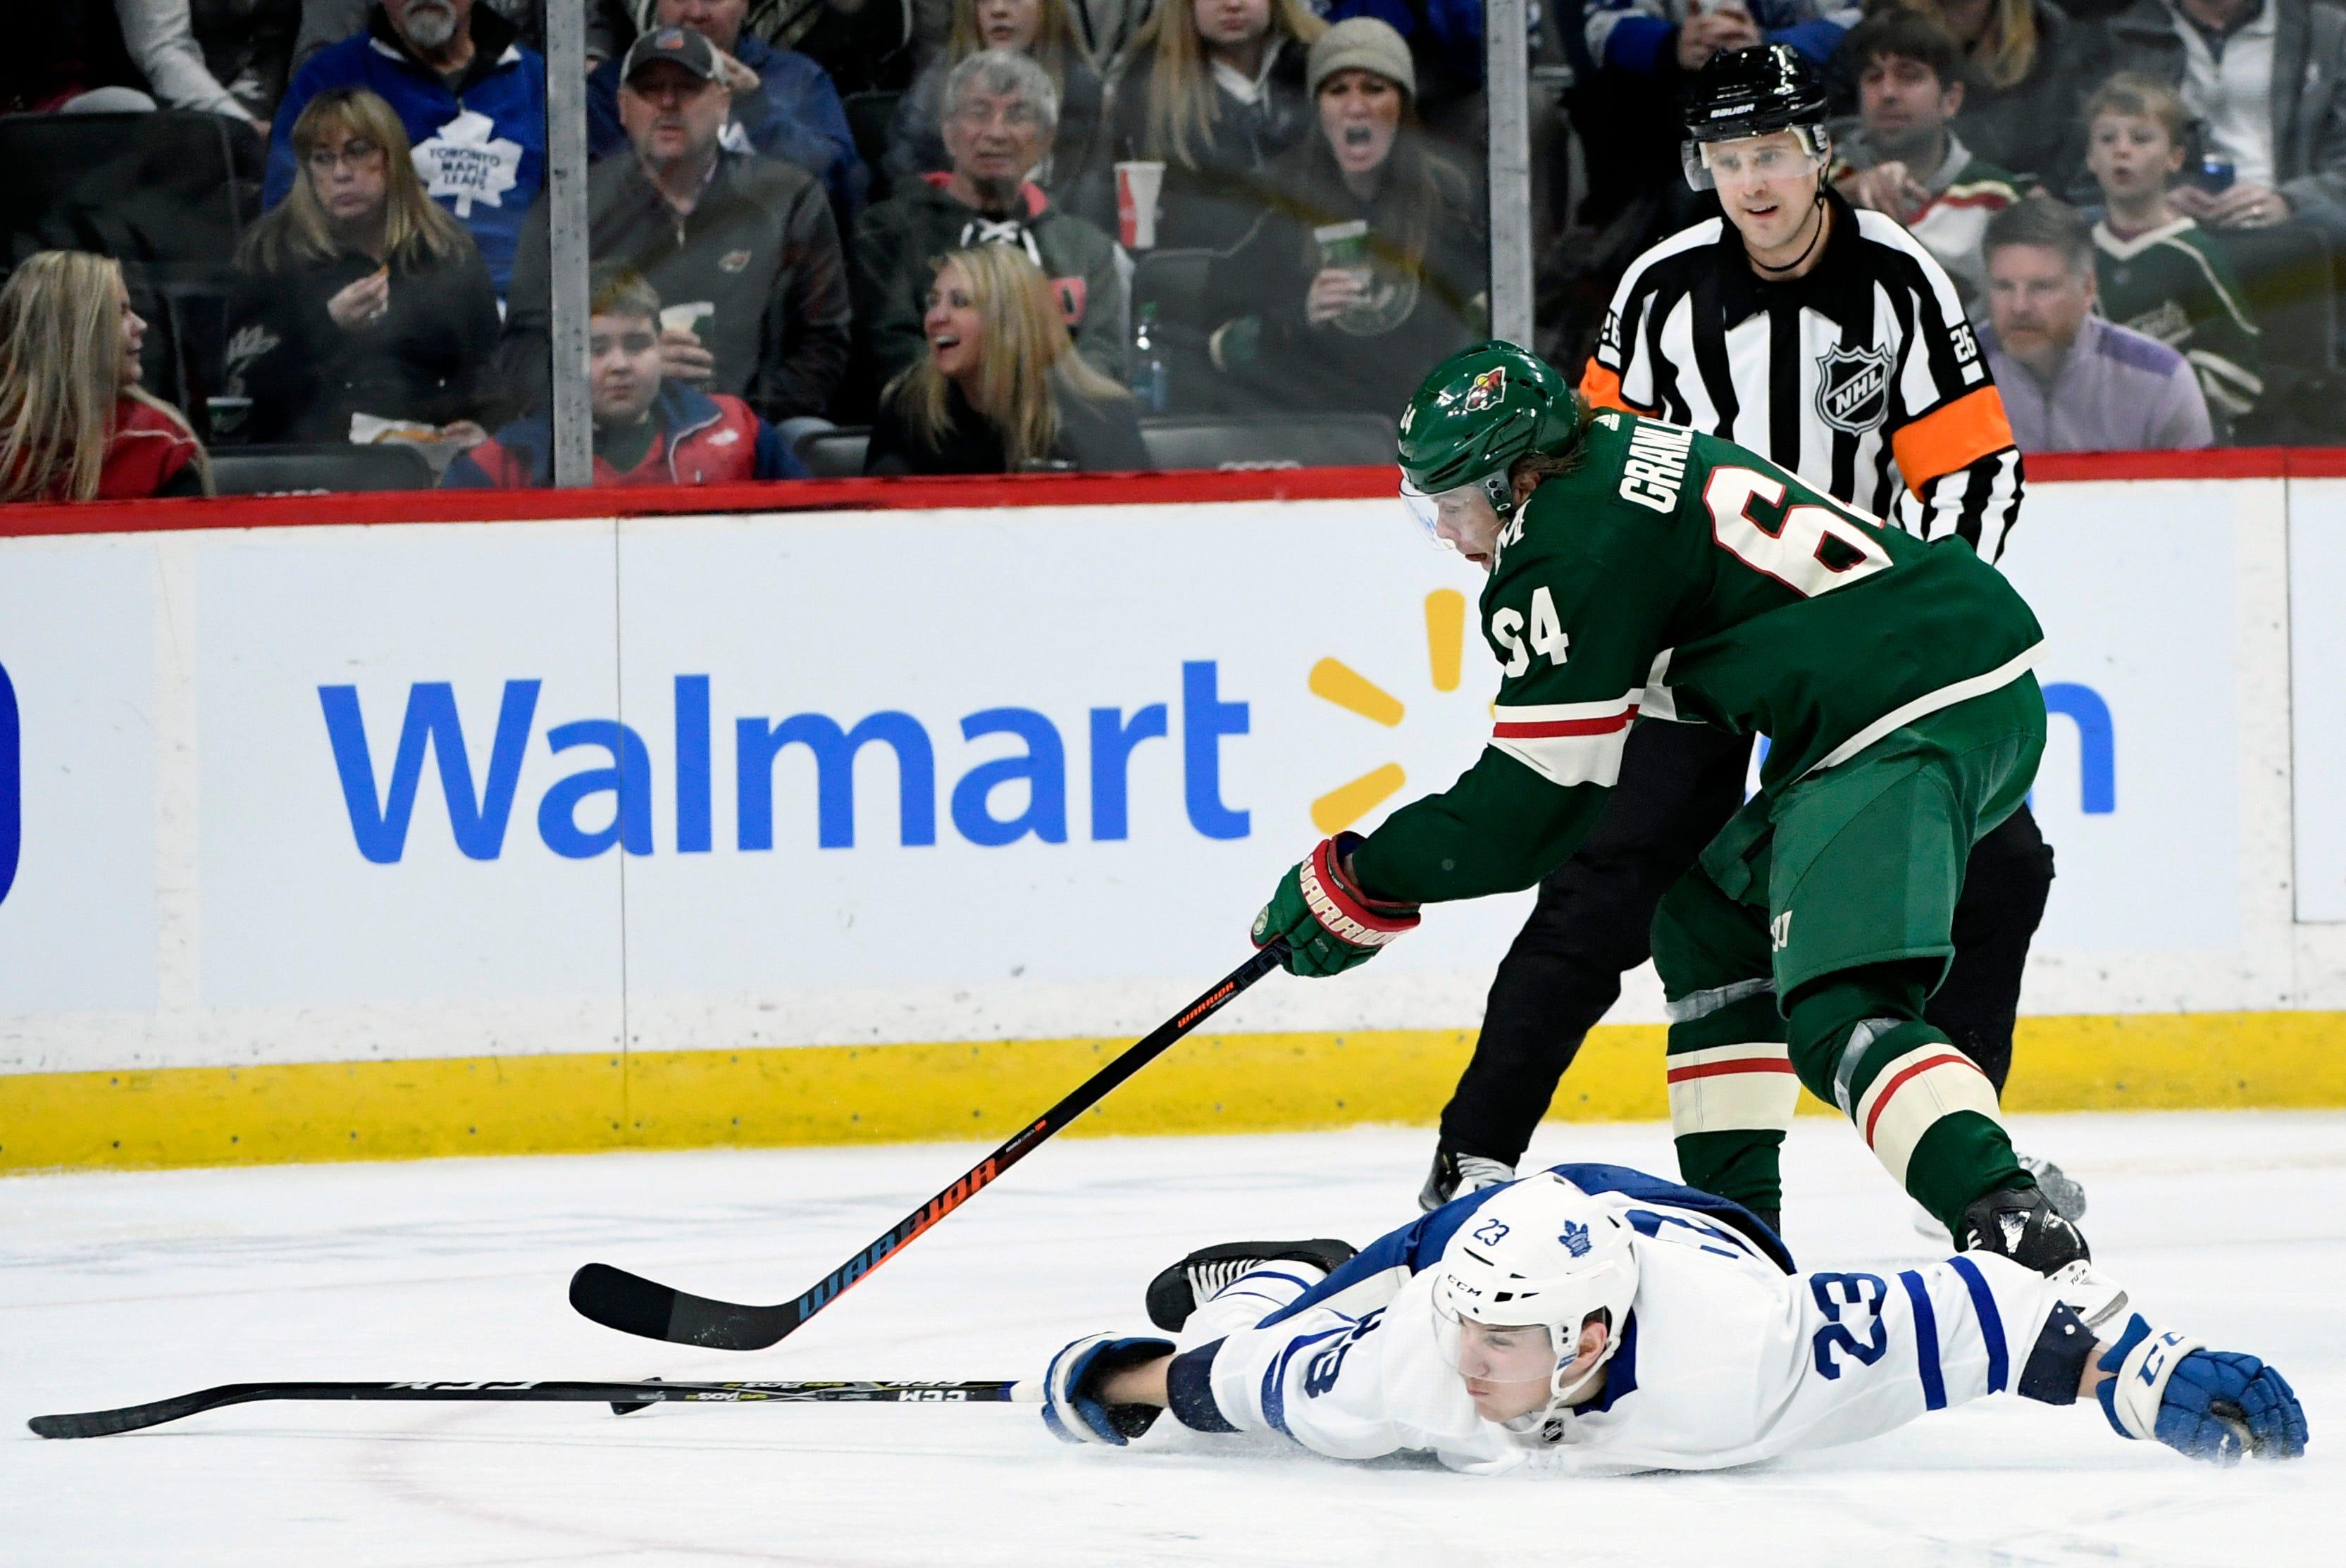 Nazem Kadri scores winner, Maple Leafs beat Wild, 5-3